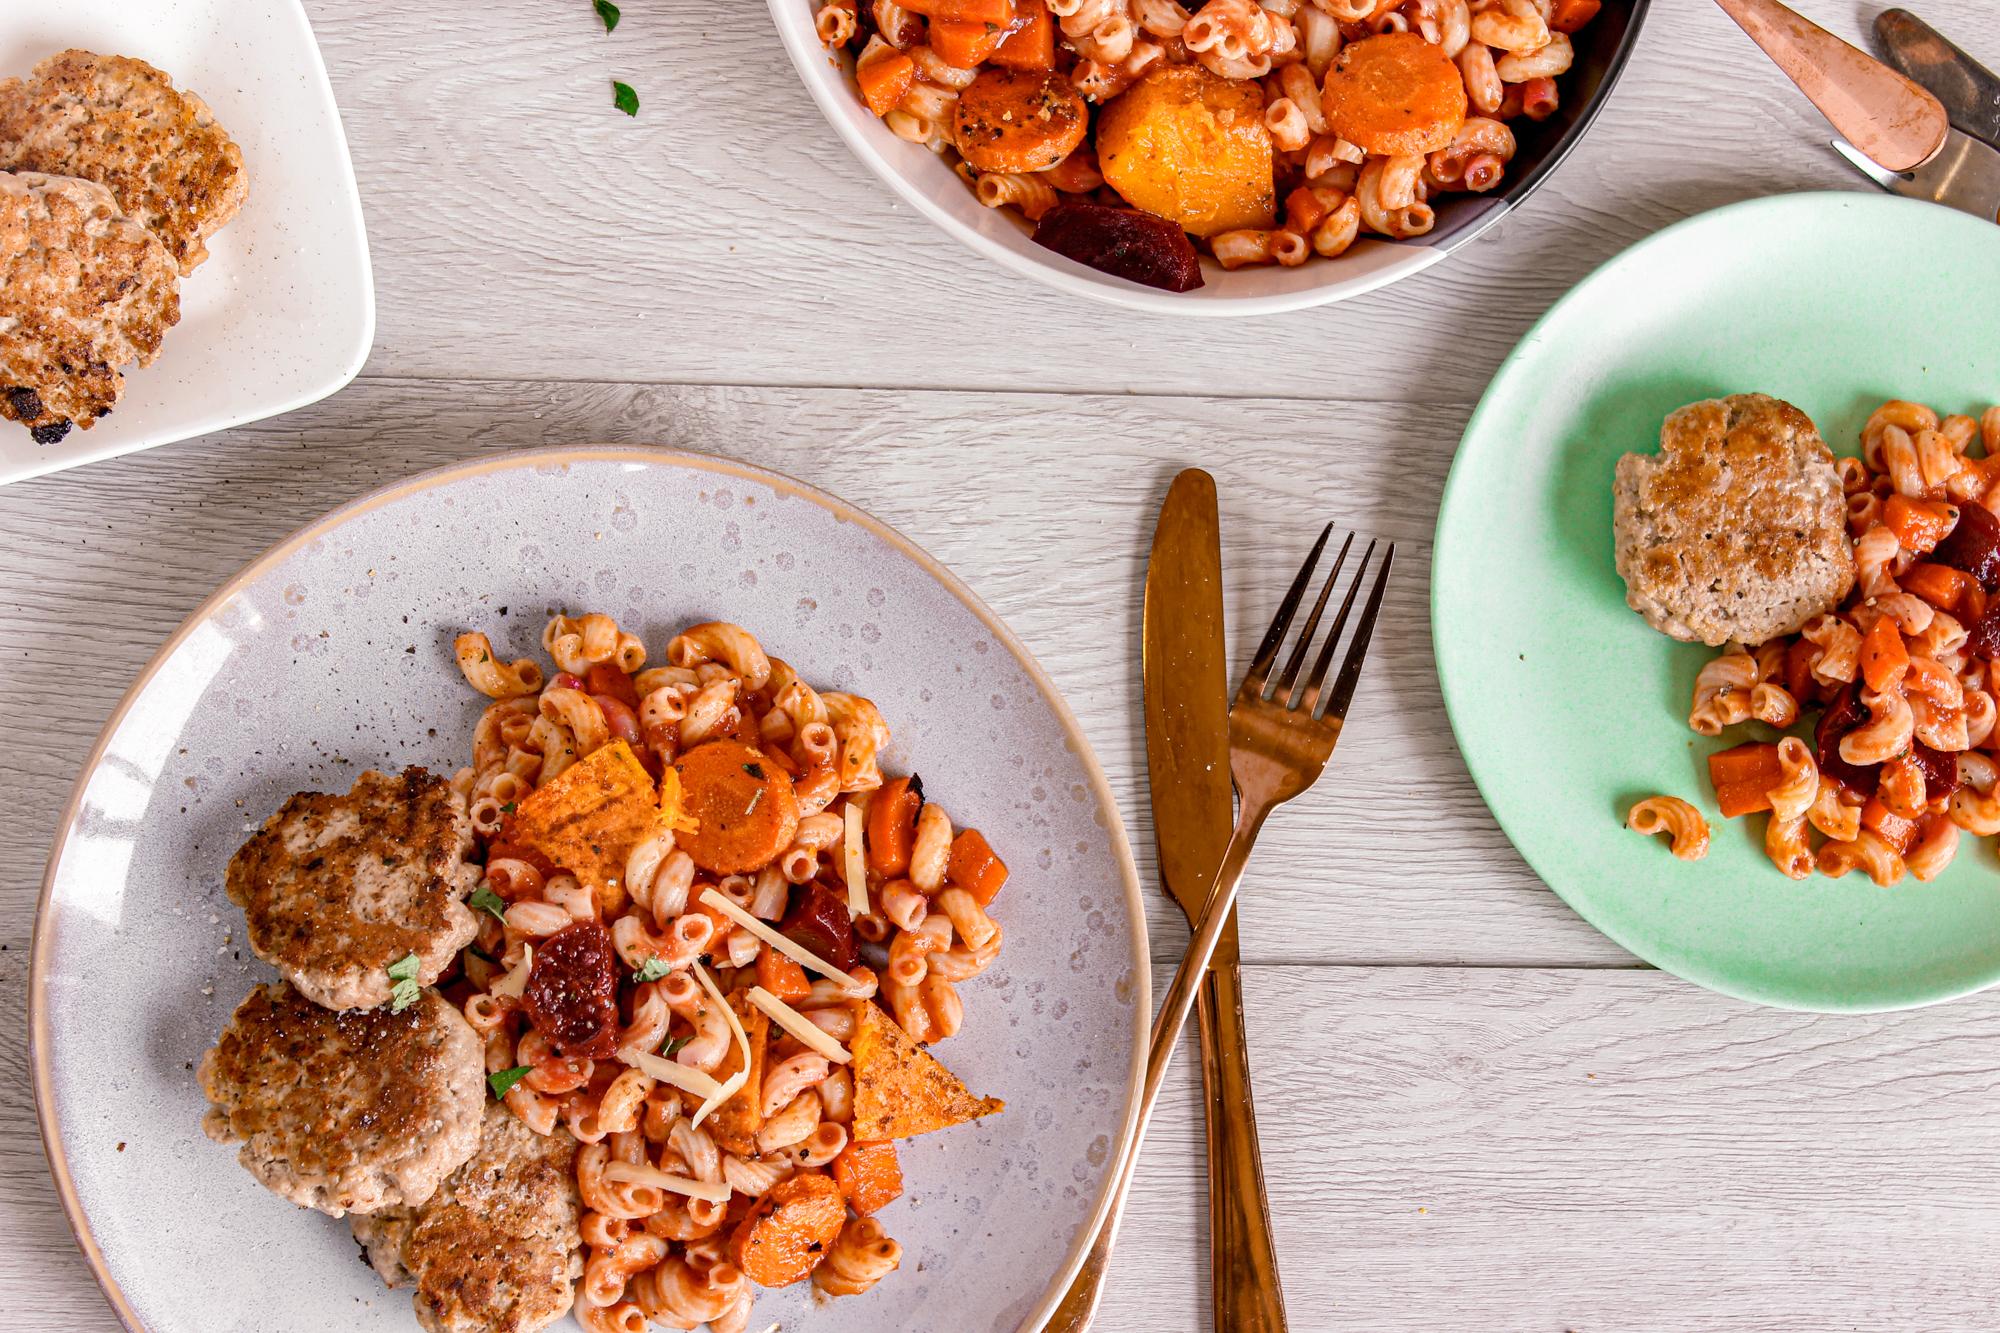 Pork rissoles and veg pasta bake